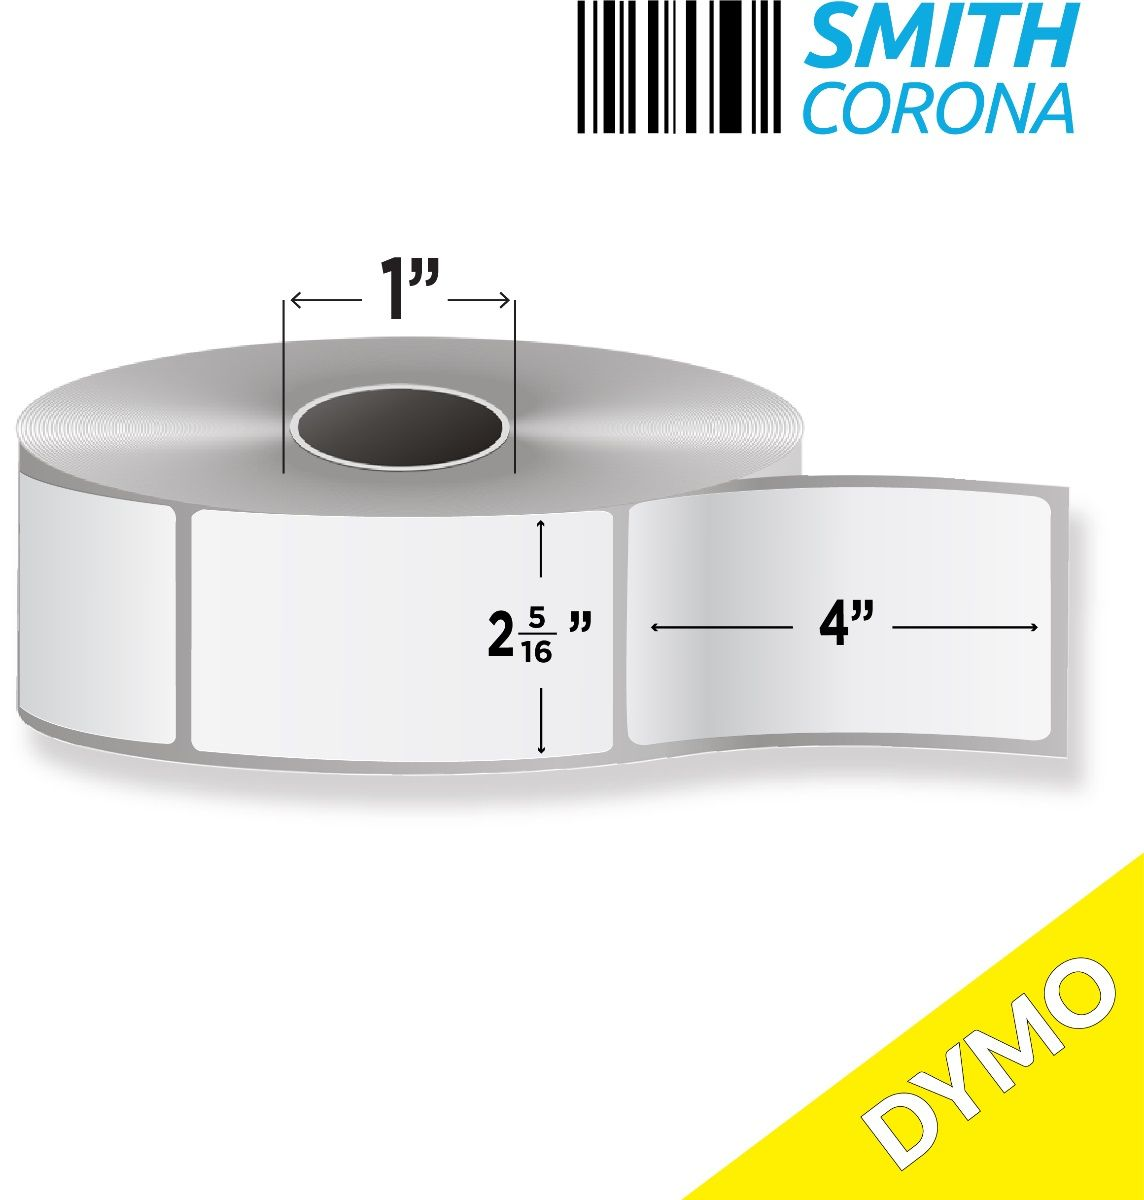 2 5/16 x 4 Dymo Labels